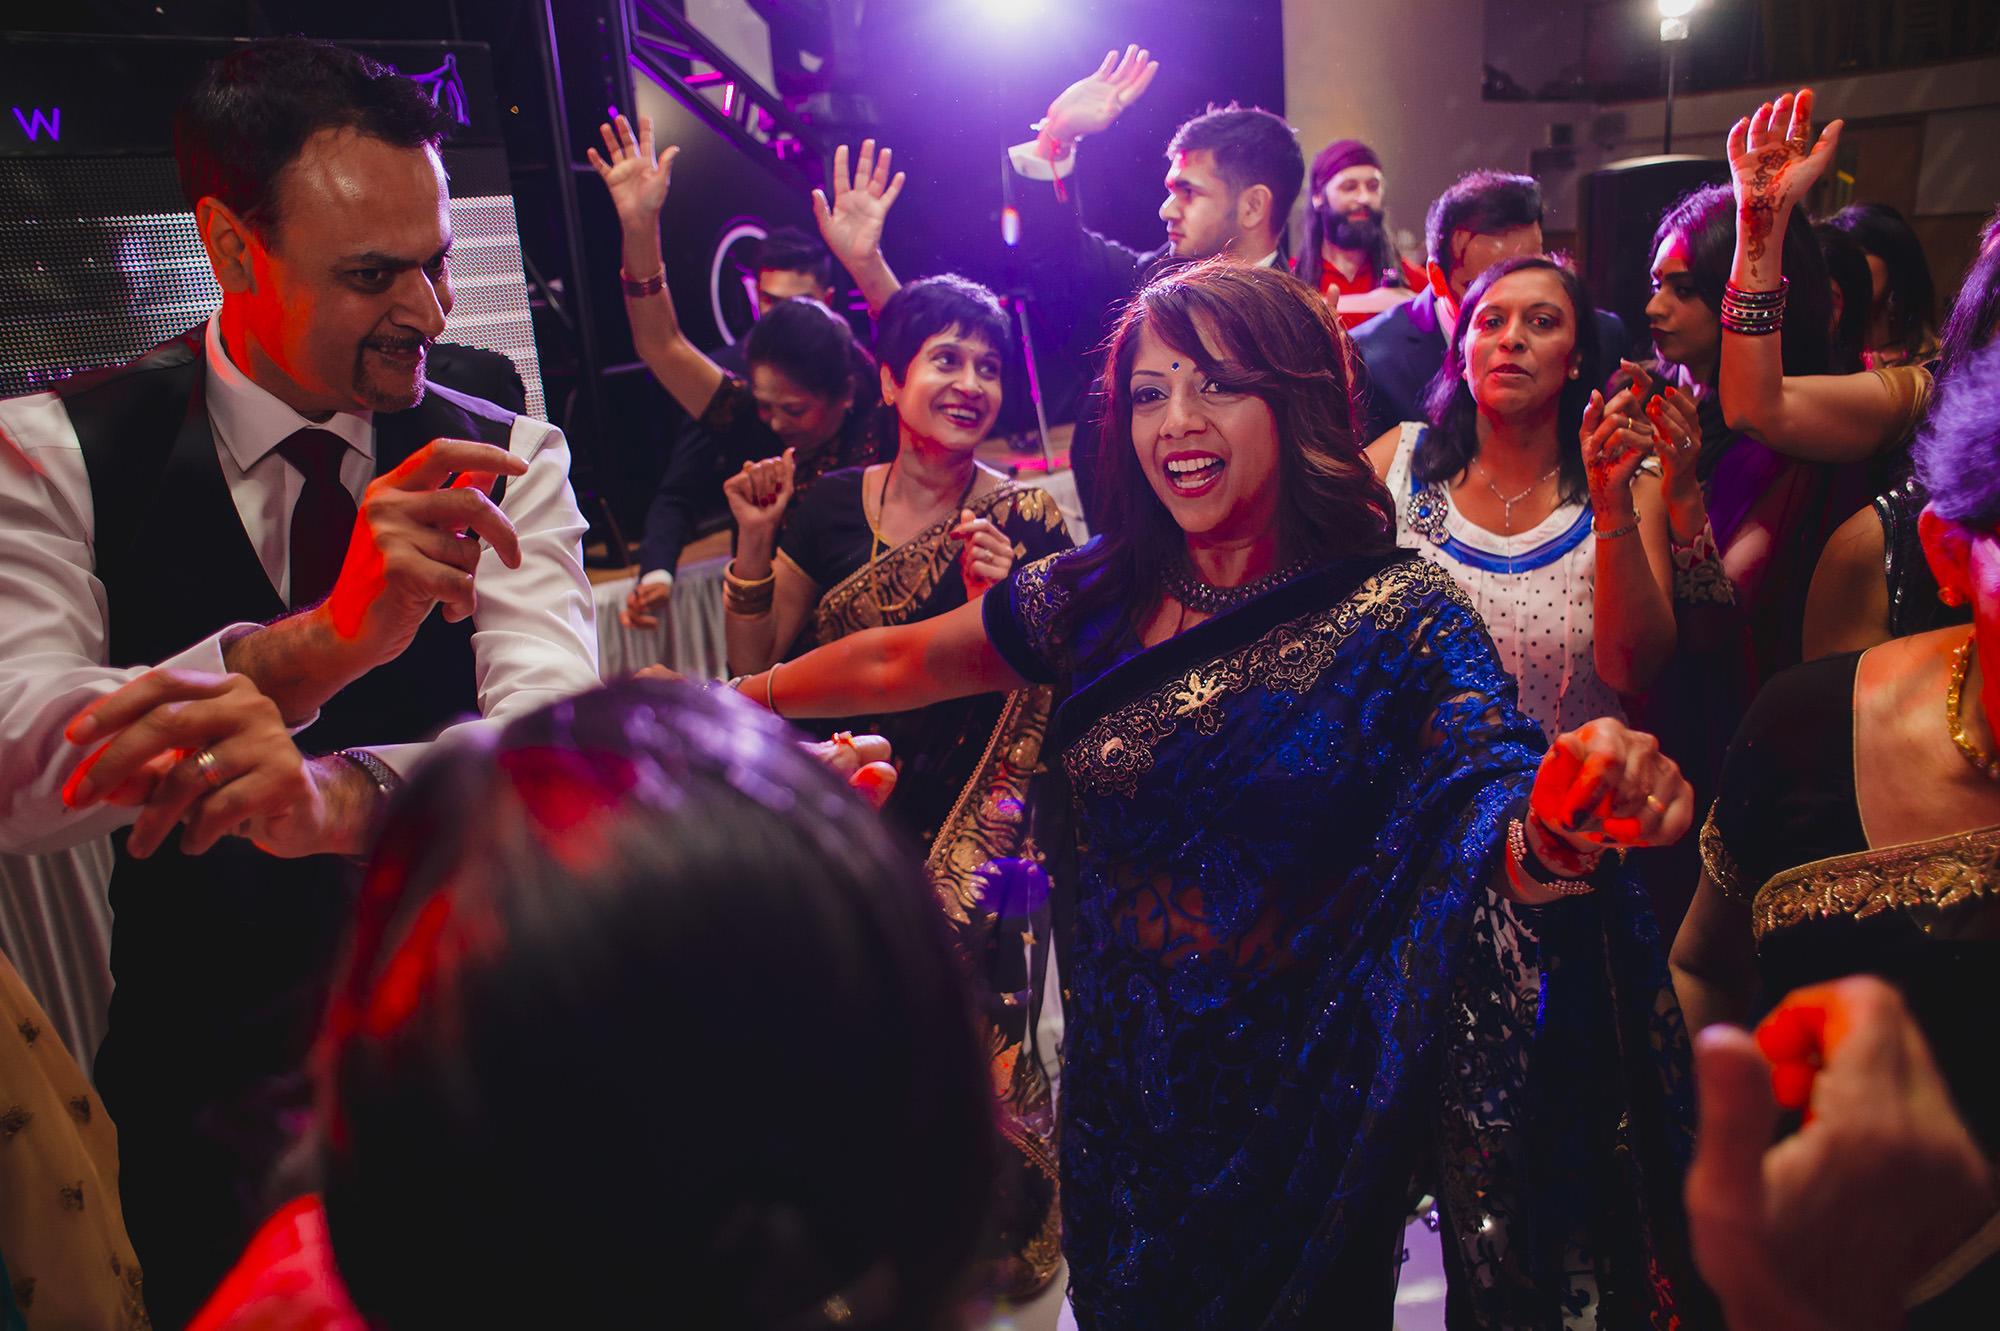 family dancing around mum during the wedding reception